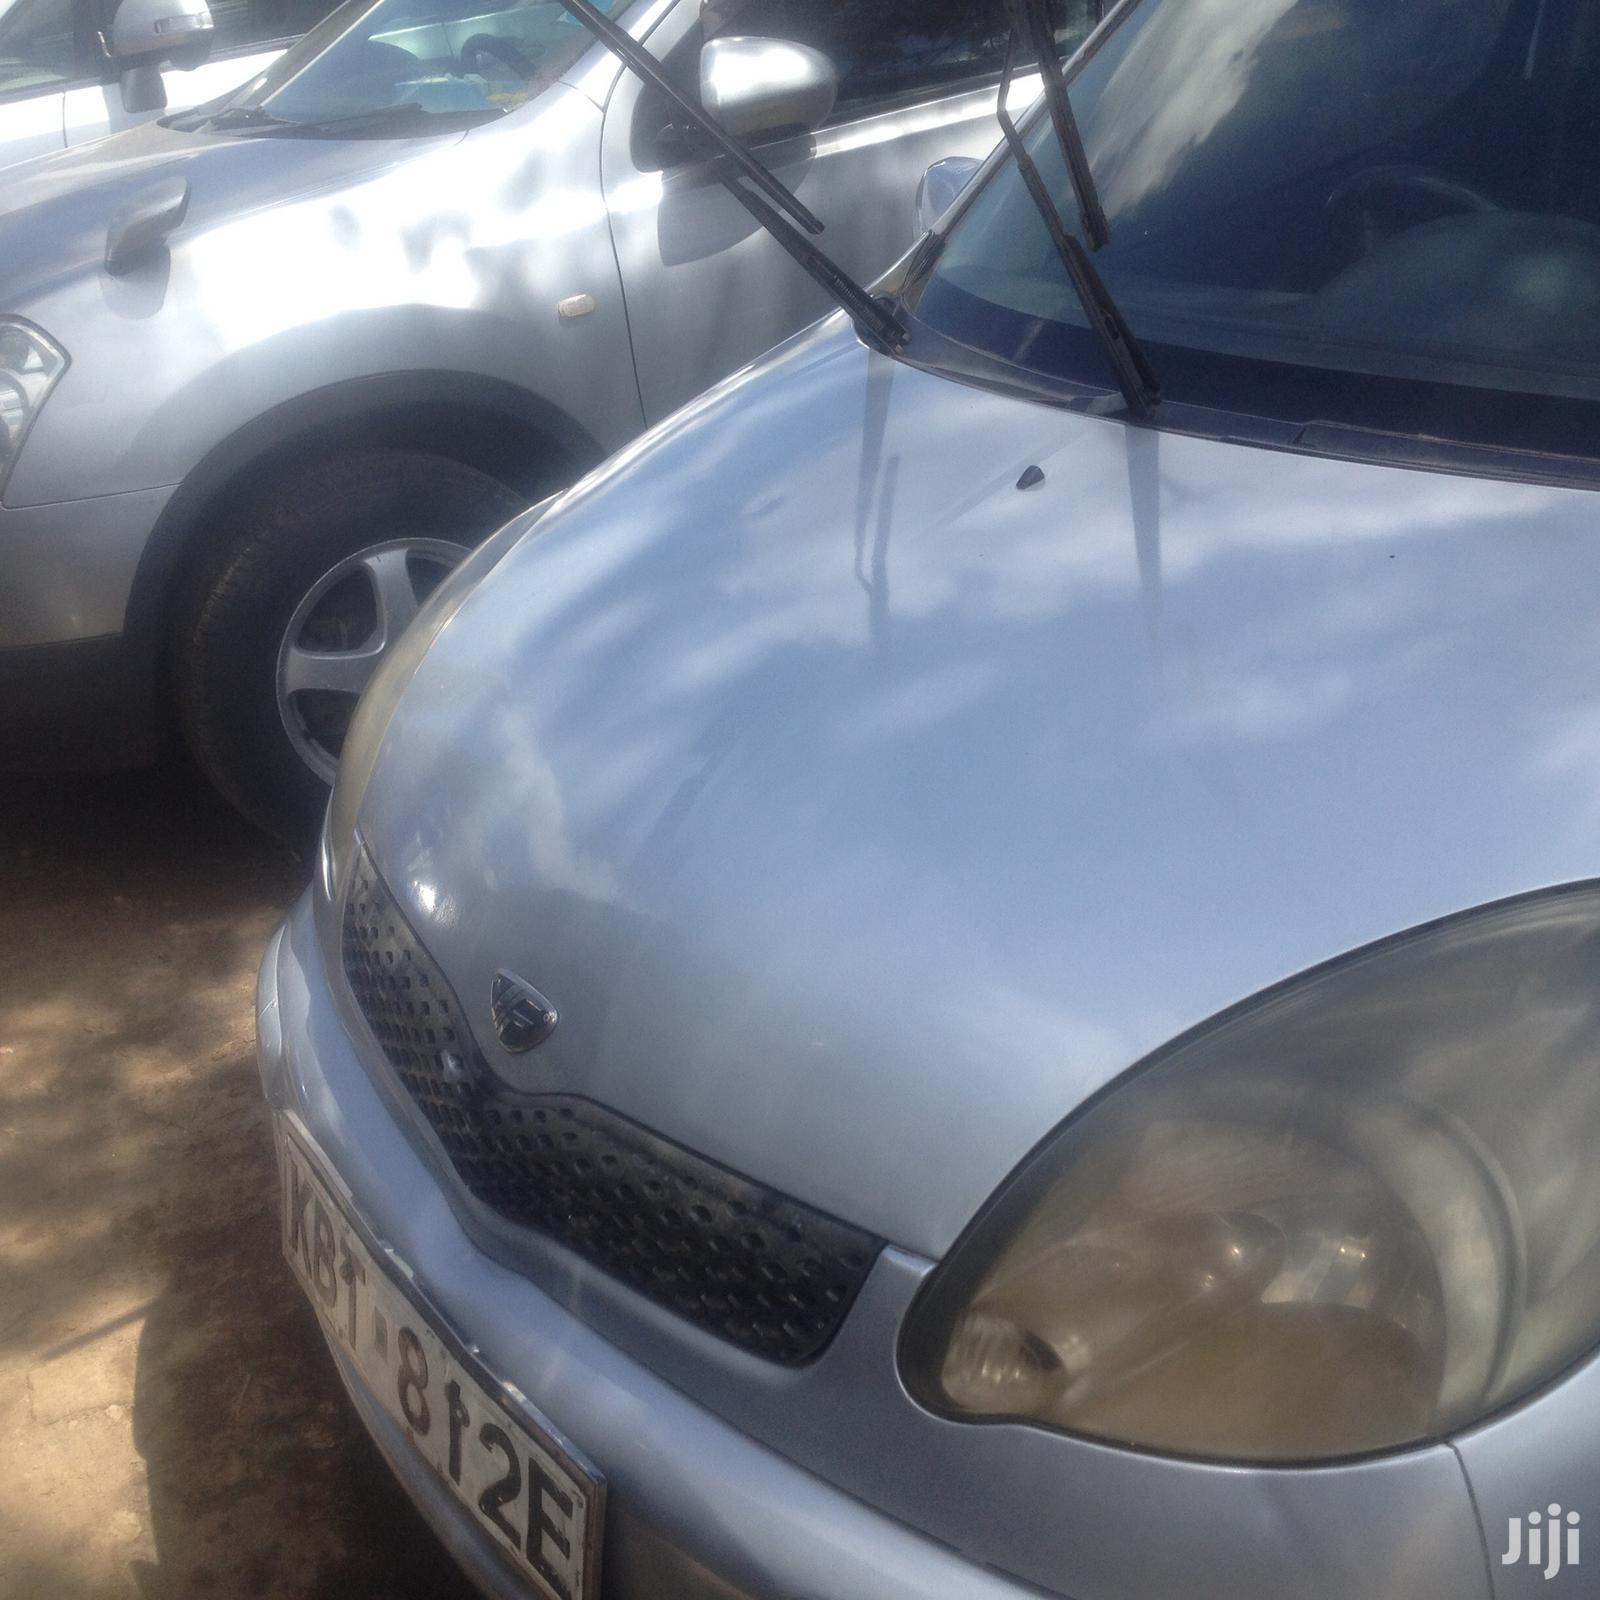 Toyota Fun Cargo 2004 Silver   Cars for sale in Komarock, Nairobi, Kenya